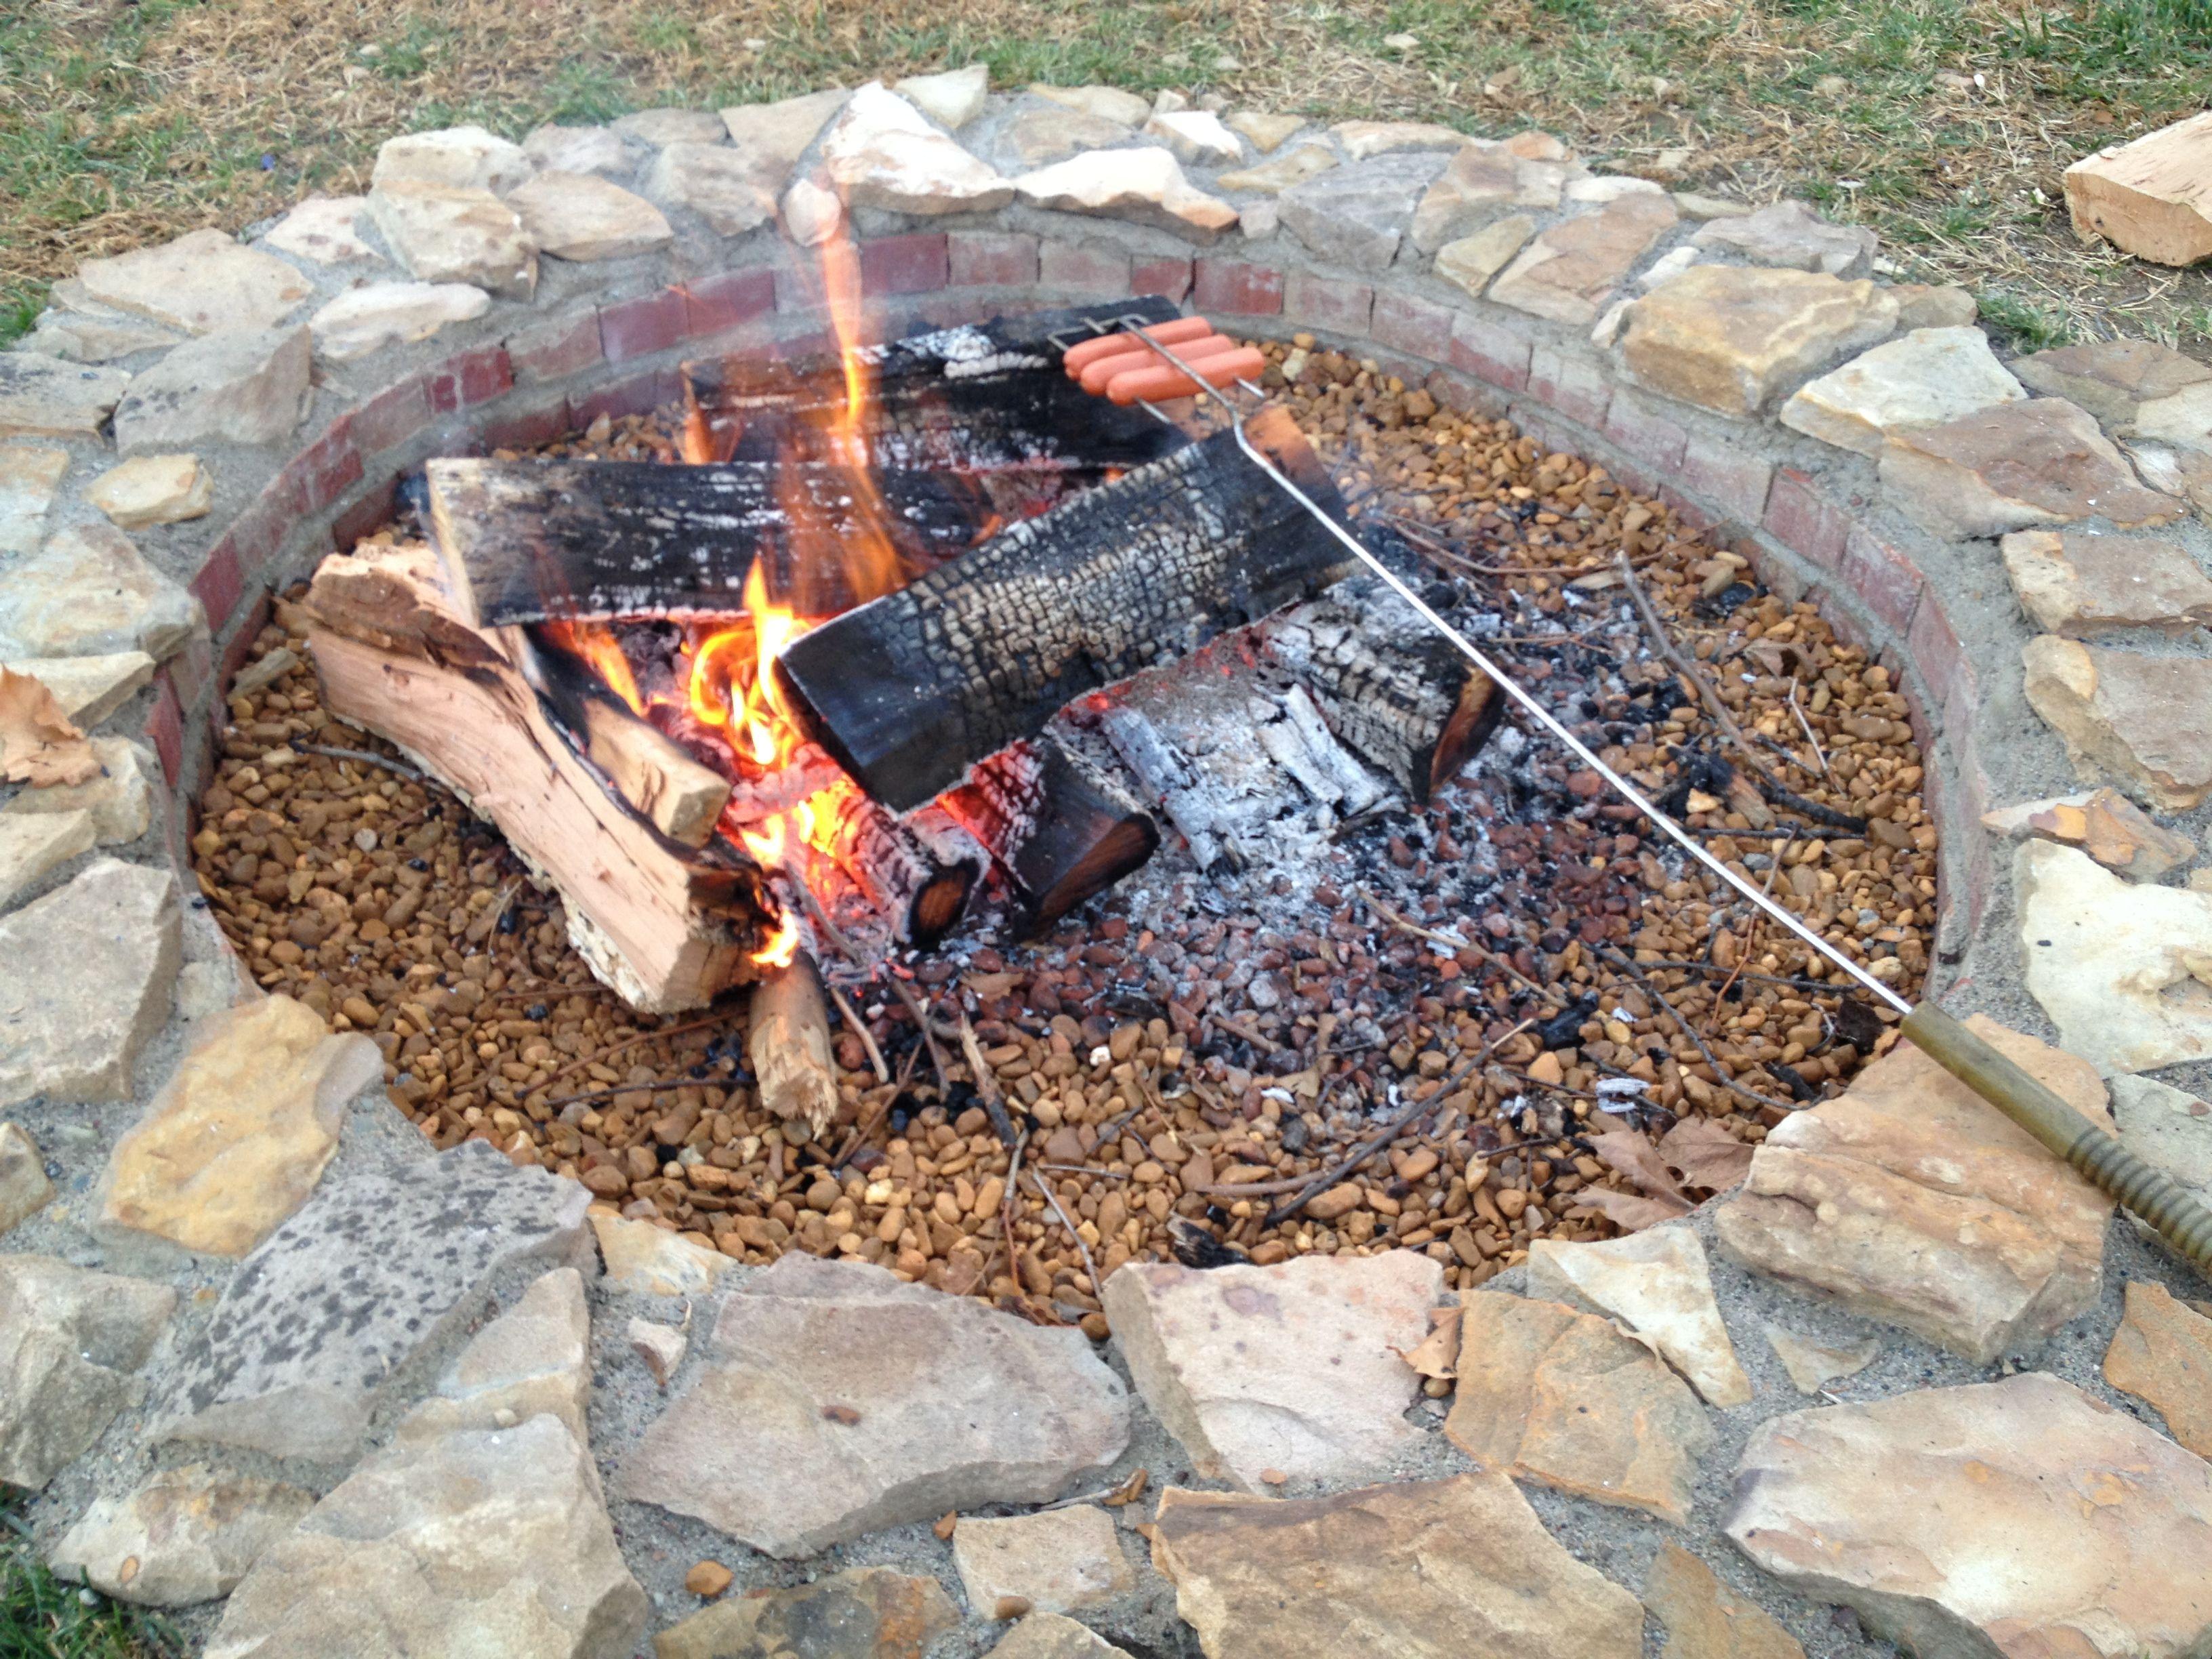 Pin By Laura Kidd On Flower Garden Garden Fire Pit Fire Pit Backyard Fire Pit